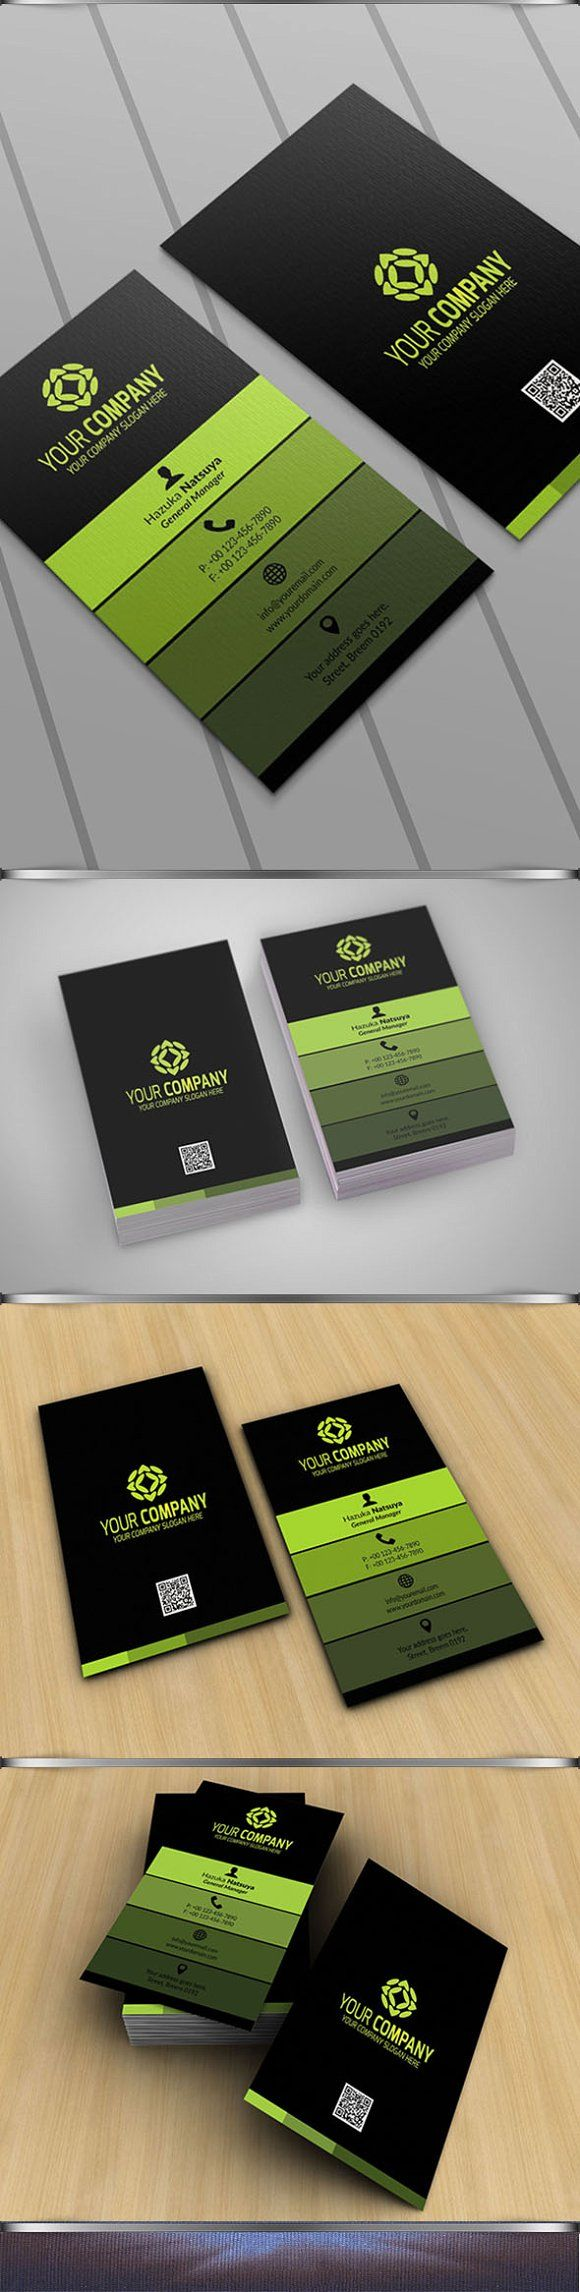 Best 25 sample business cards ideas on pinterest samples of best 25 sample business cards ideas on pinterest samples of business cards business cards and visiting card design sample magicingreecefo Images